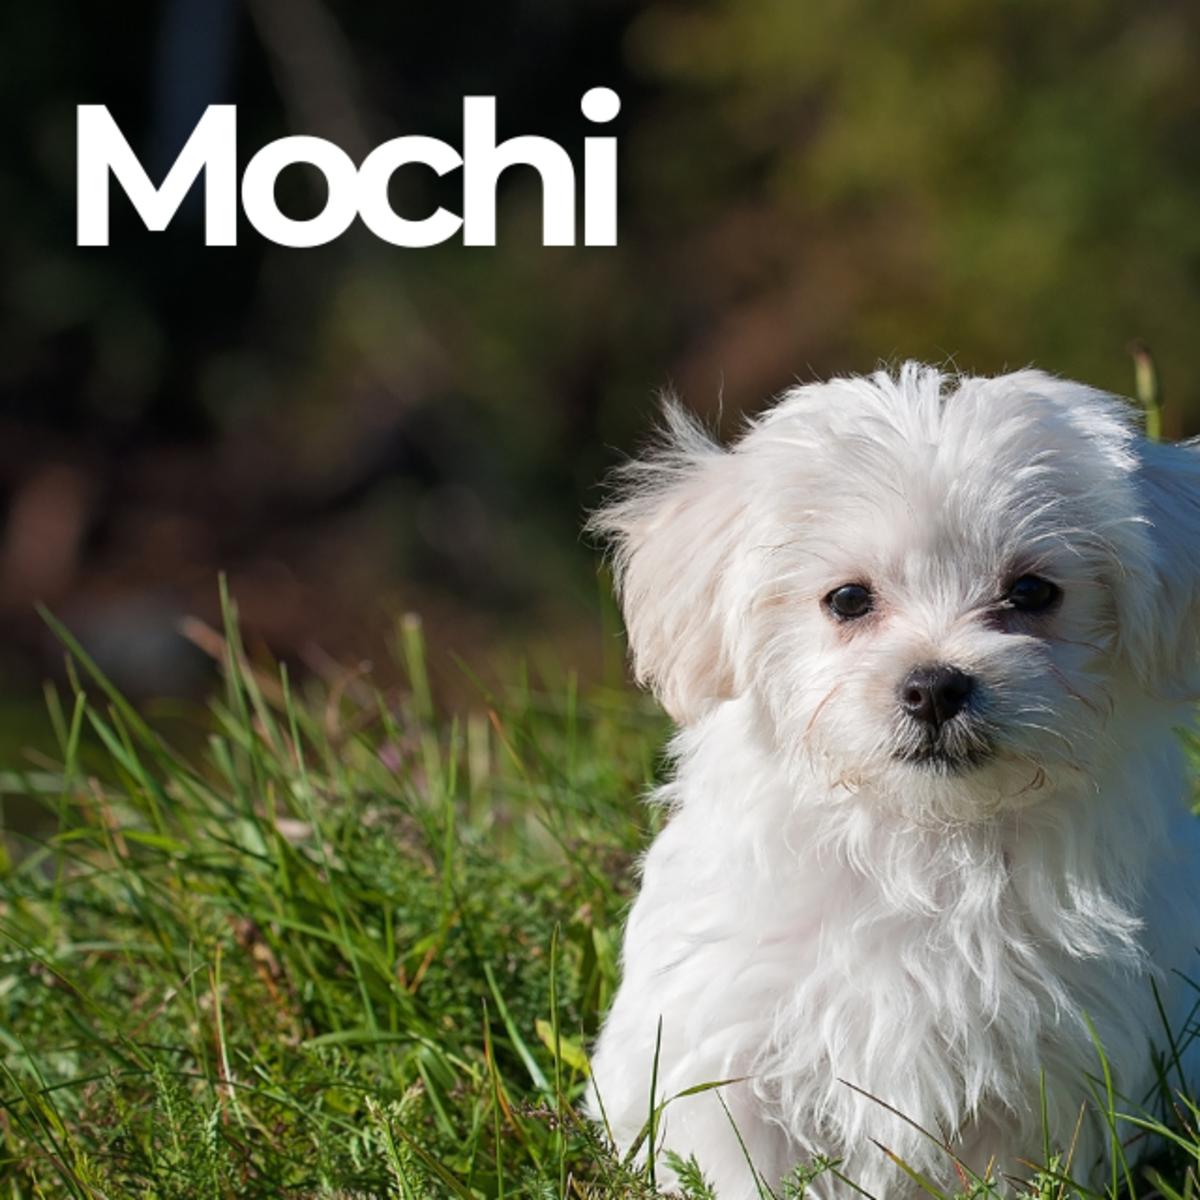 Puppy named Mochi